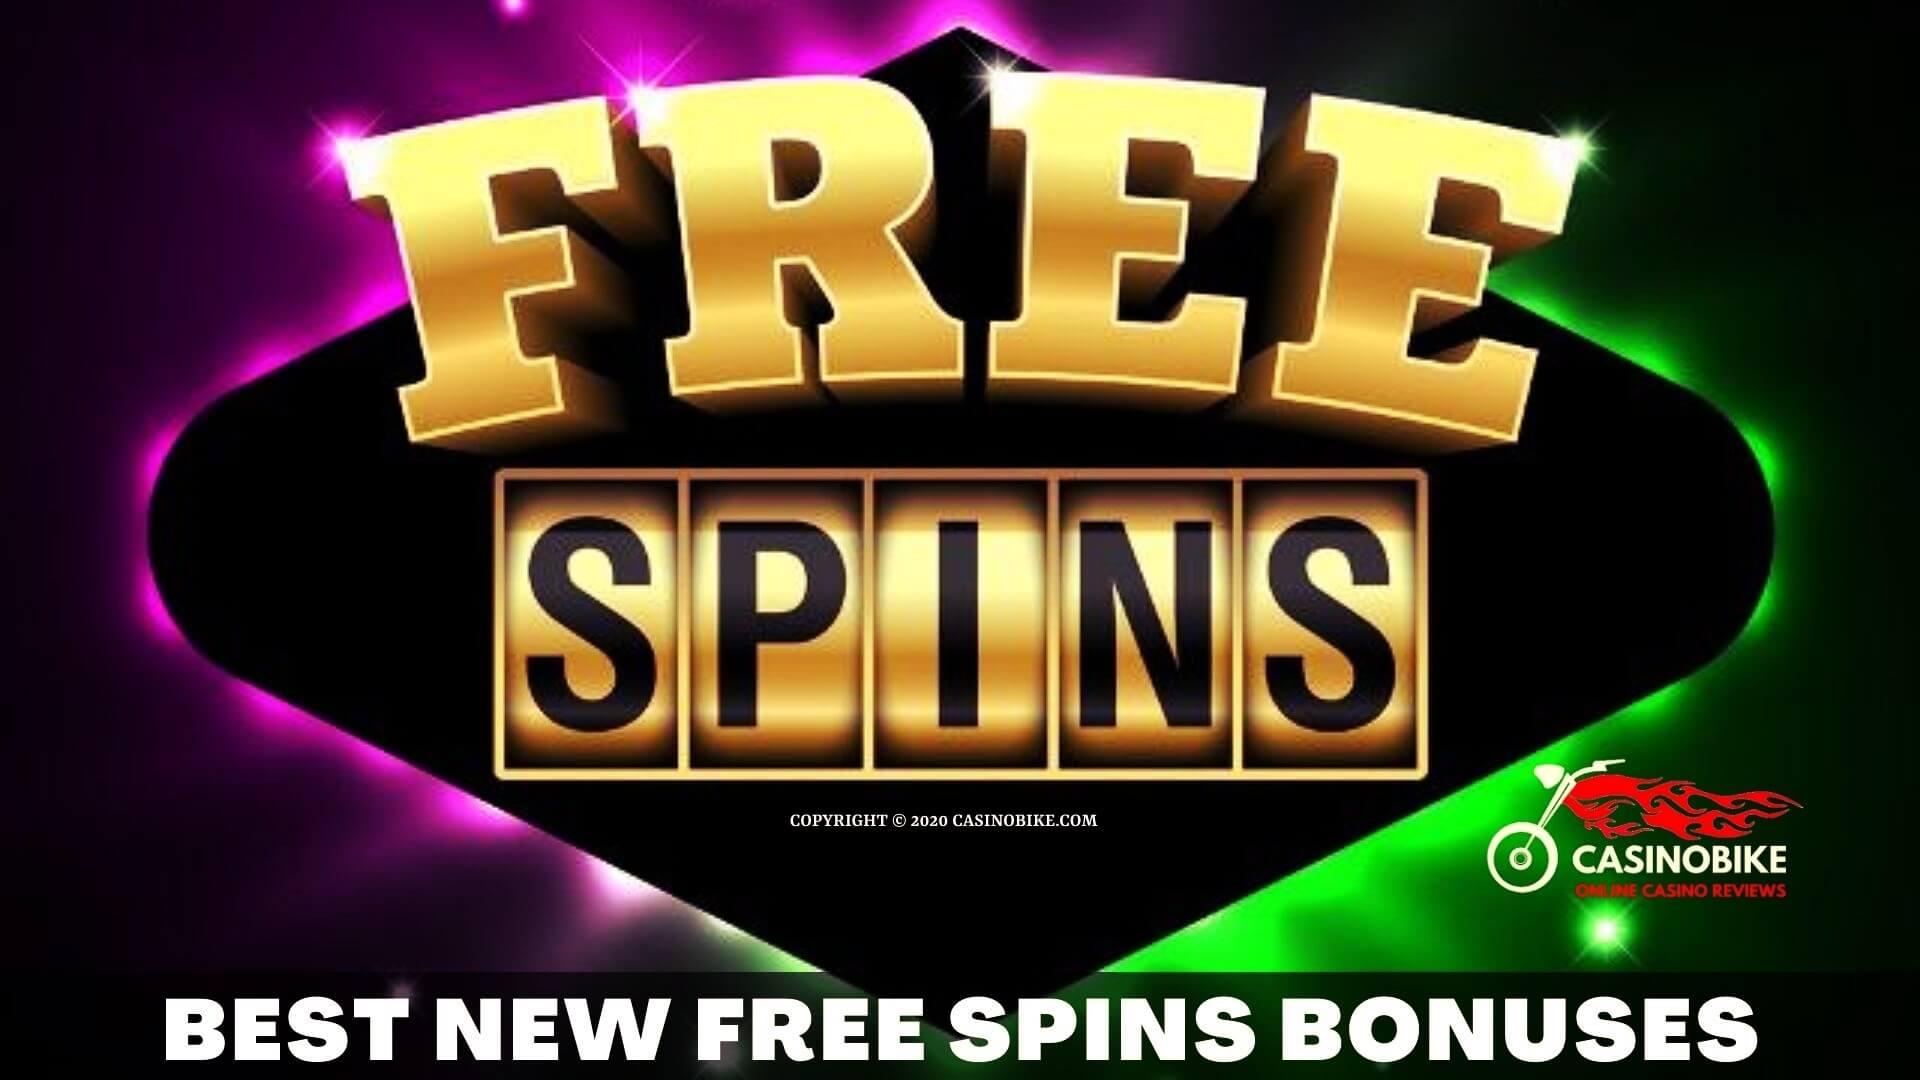 Best New Casino Free Spins Bonuses